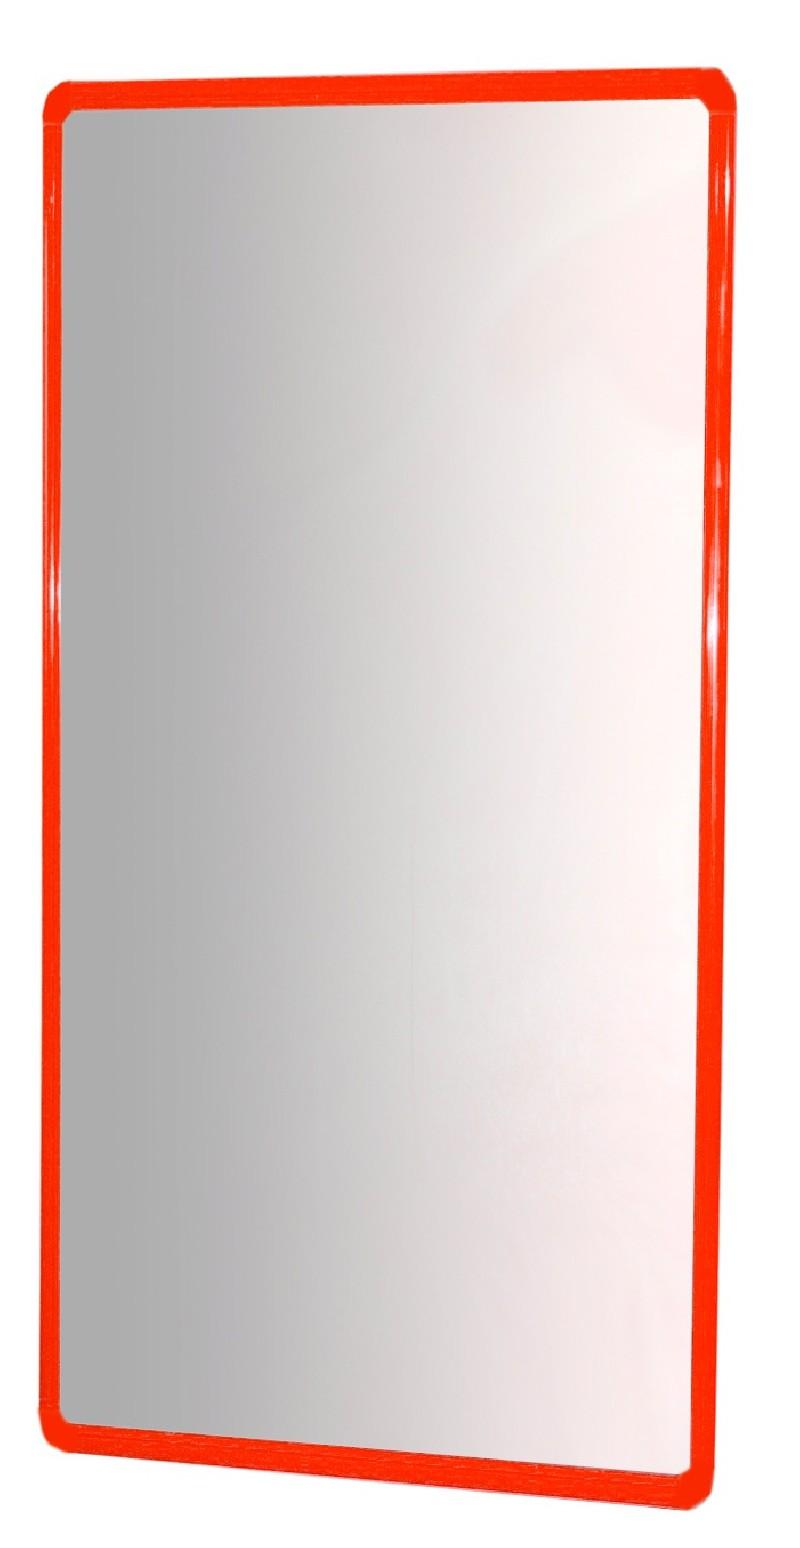 Aluminium Acrylic Mirror (120x50cm) - Snap-Edulink, S.L